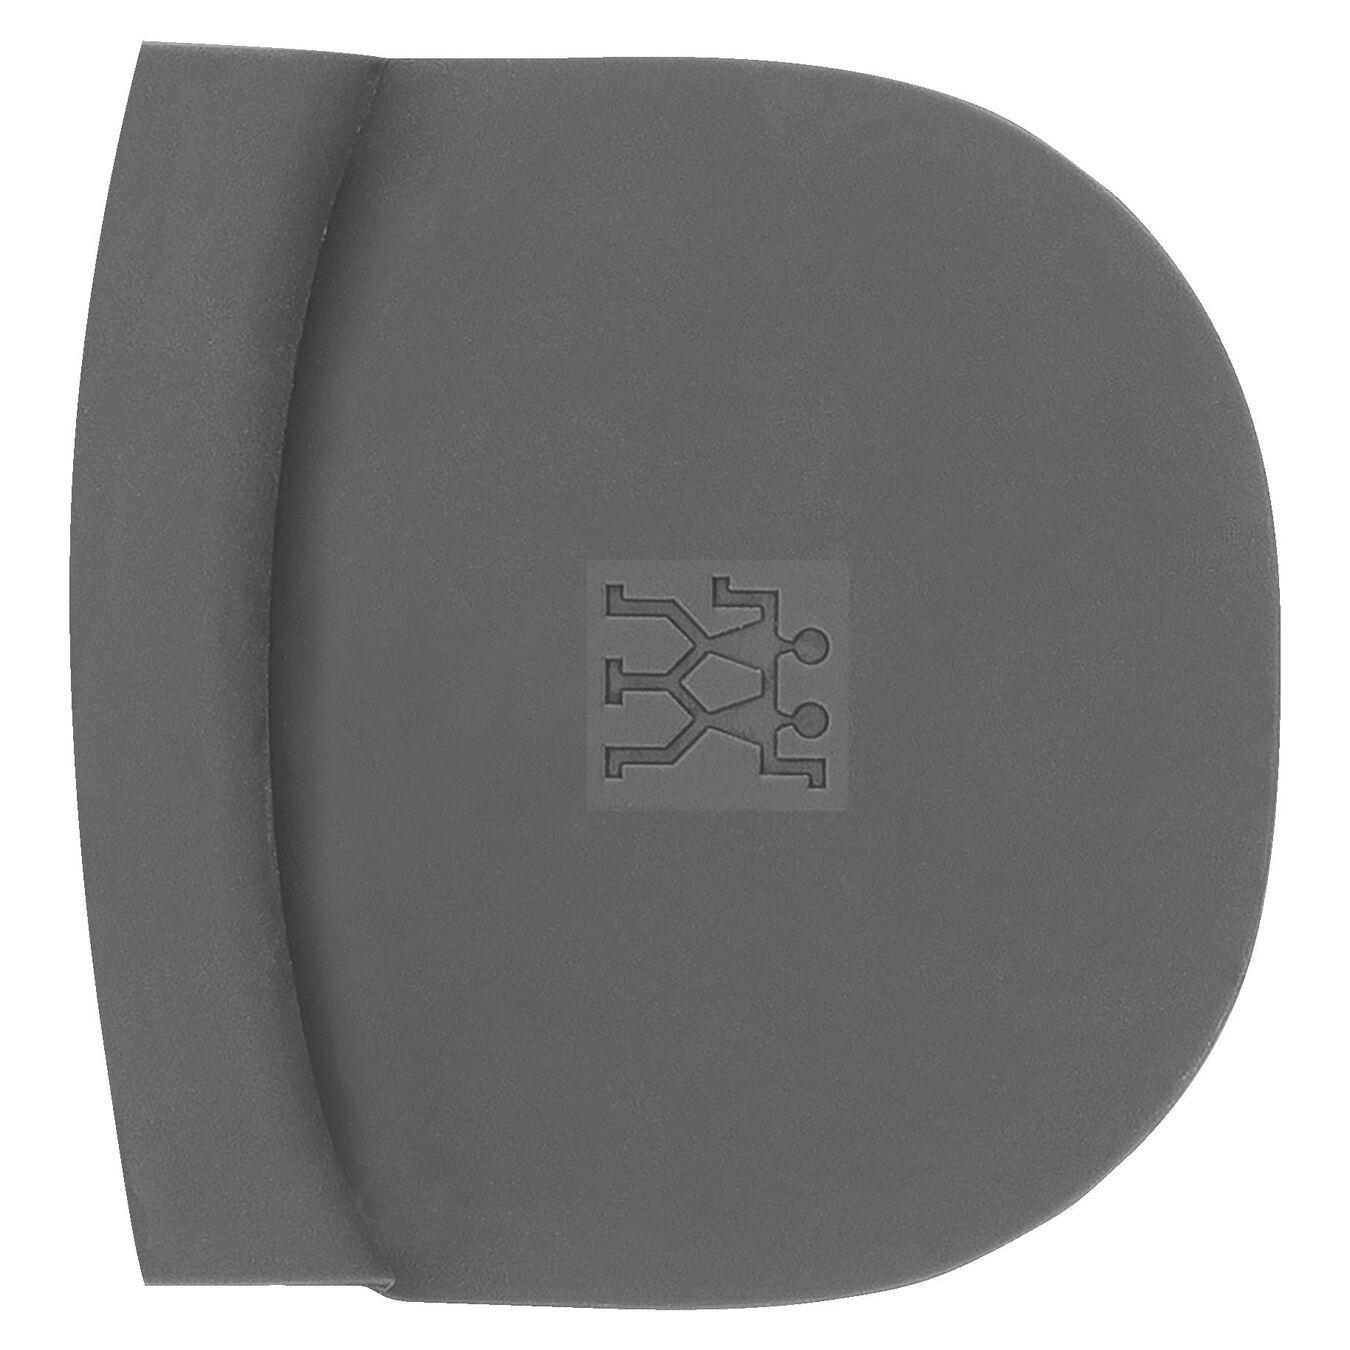 coperchio per cottura a bassa temperatura 24 cm, 18/10 acciaio inossidabile,,large 6